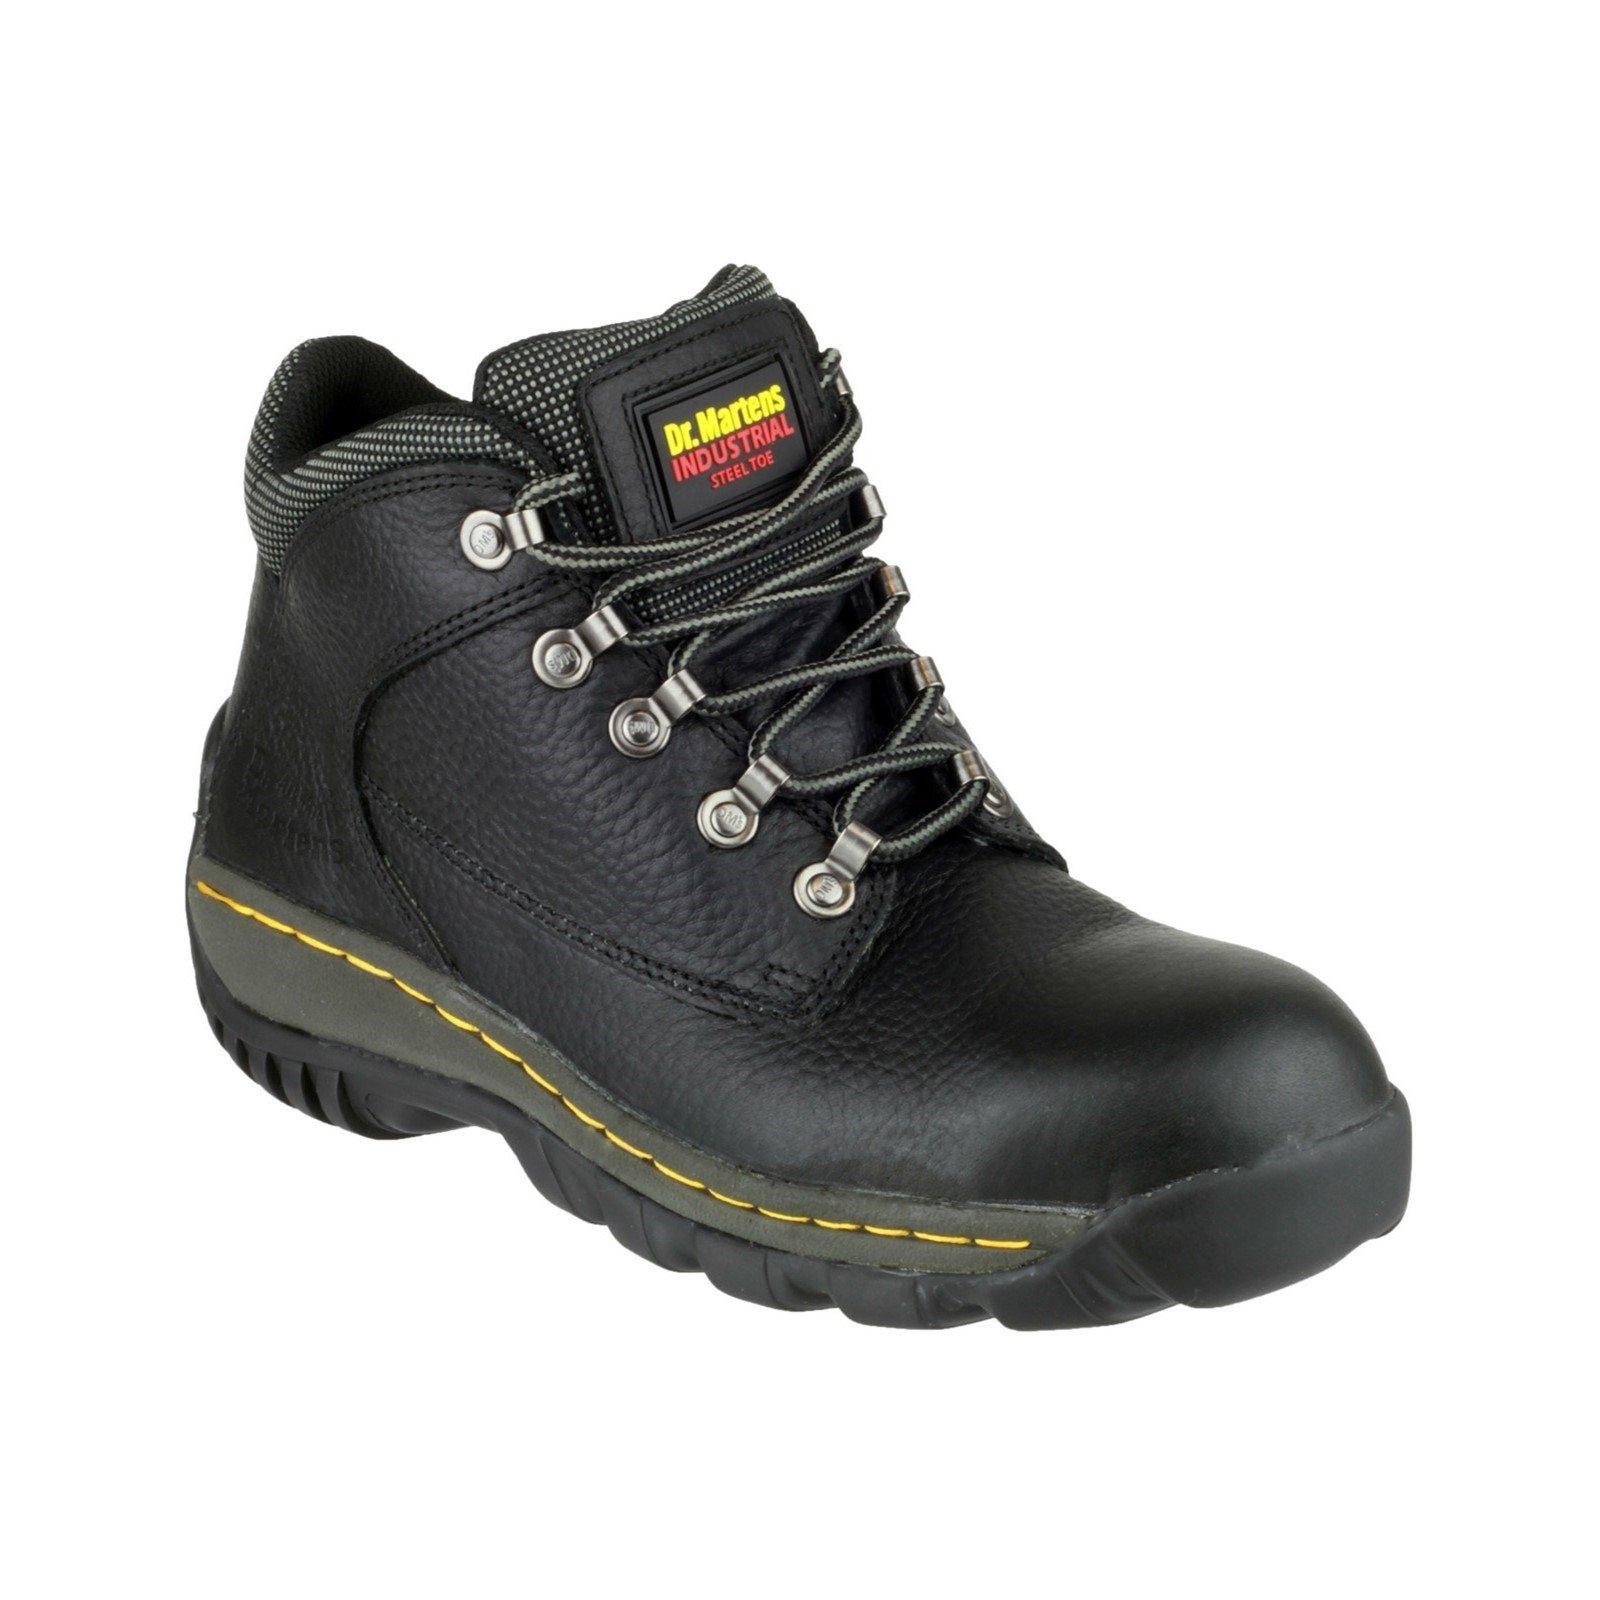 Dr Martens Unisex Lace-Up Boot Black 05207 - Black 4